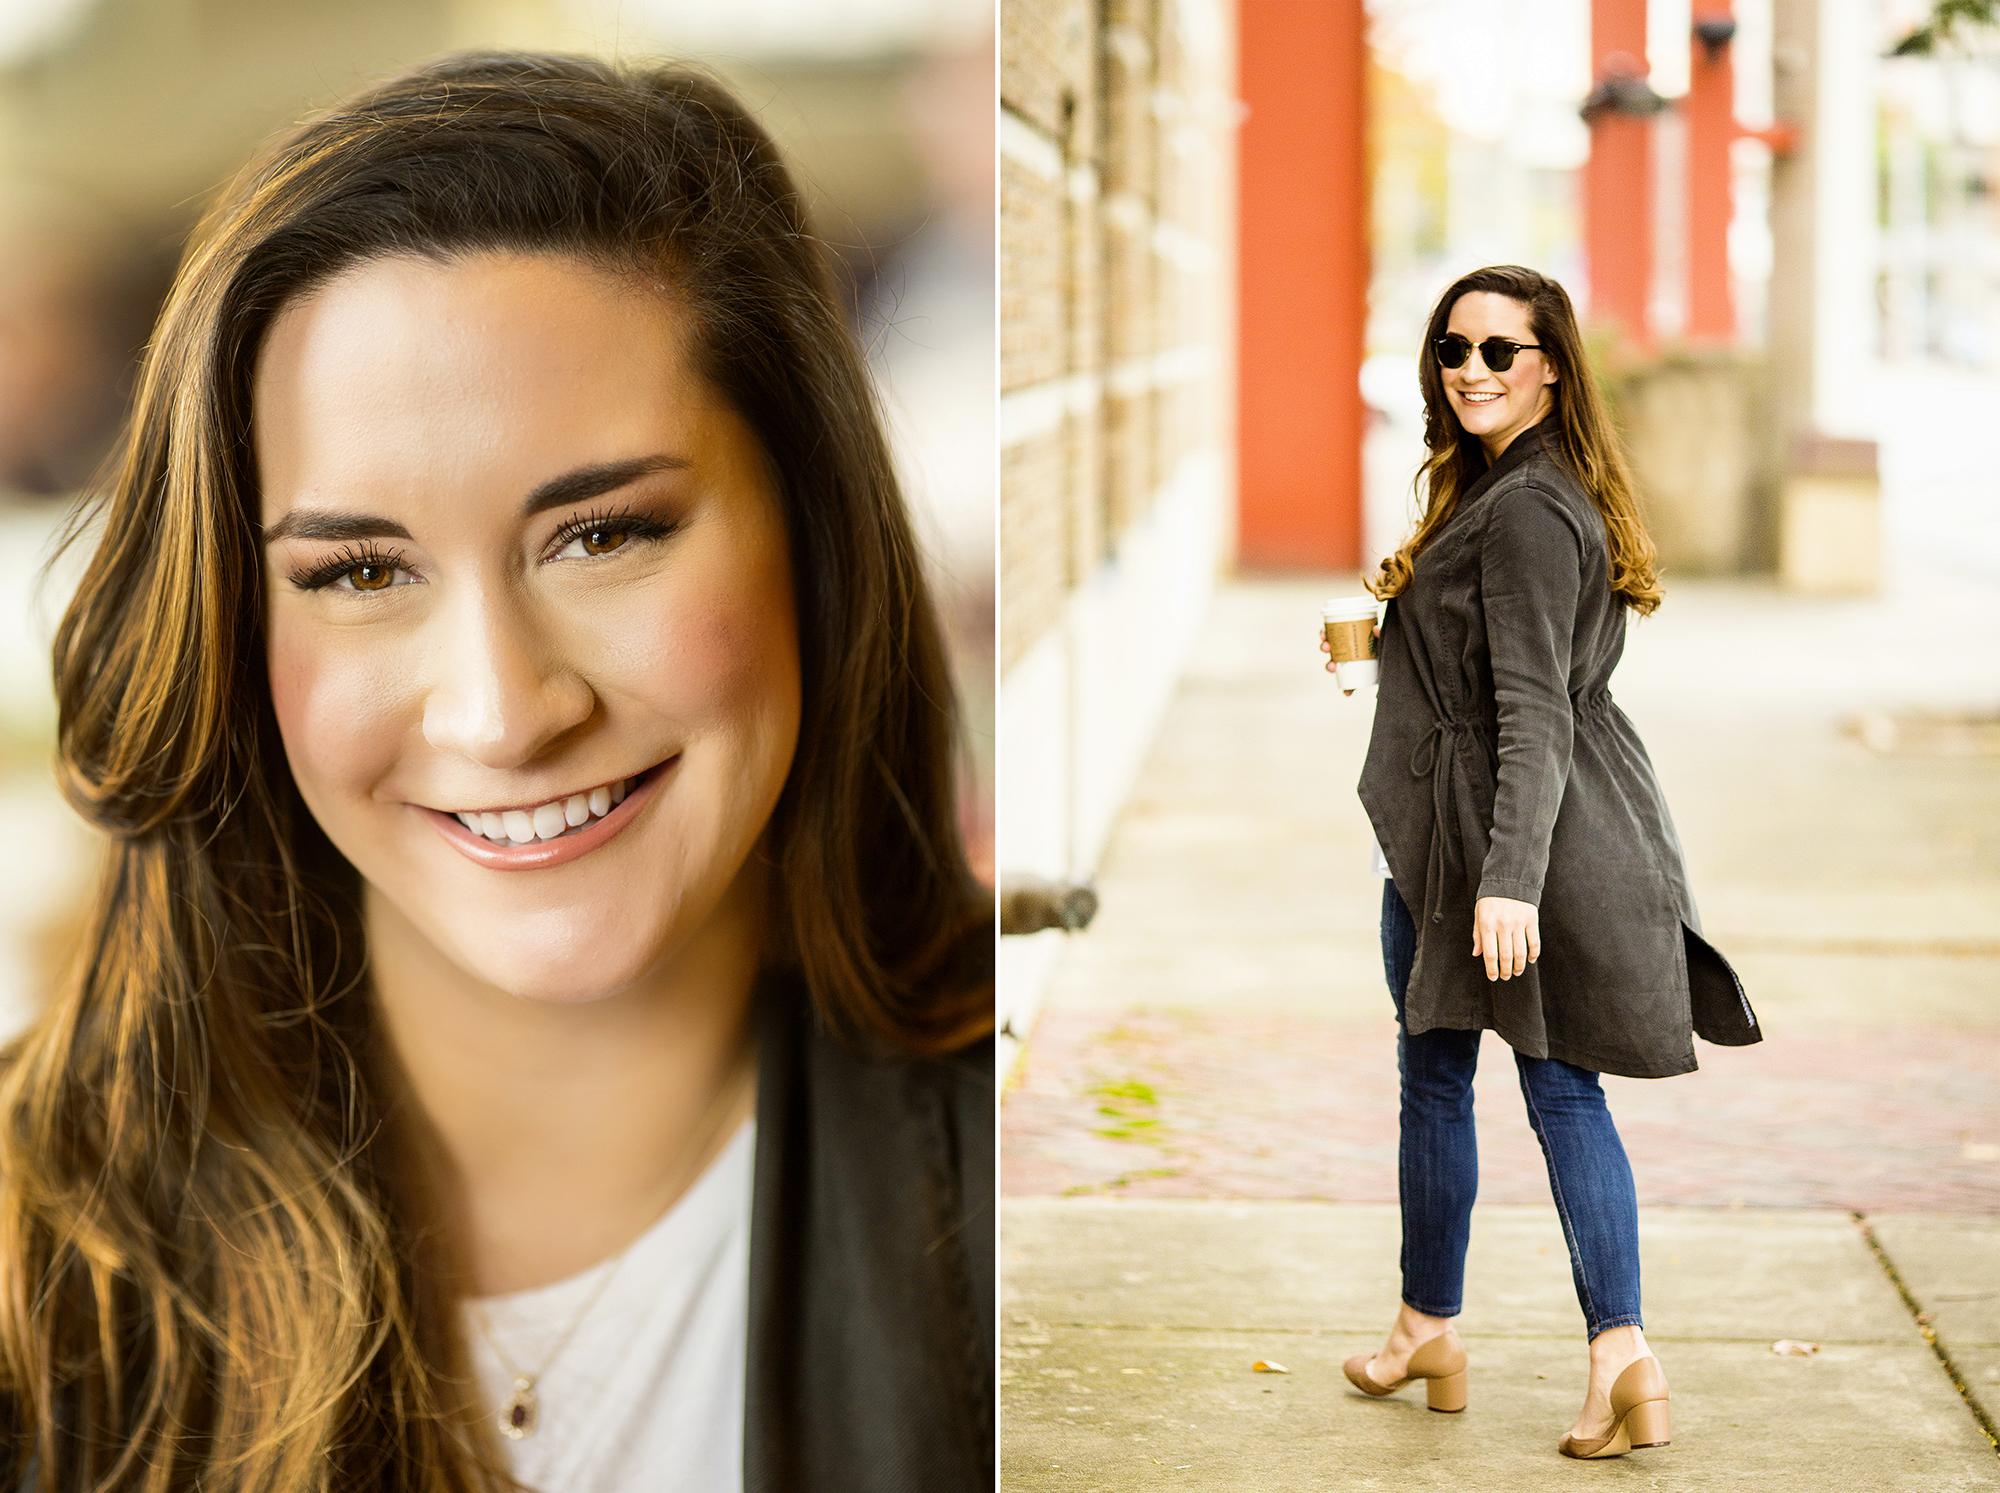 Seriously_Sabrina_Photography_Ashland_Kentucky_Fashion_Blogger_Portraits_LaurenFannin3.jpg